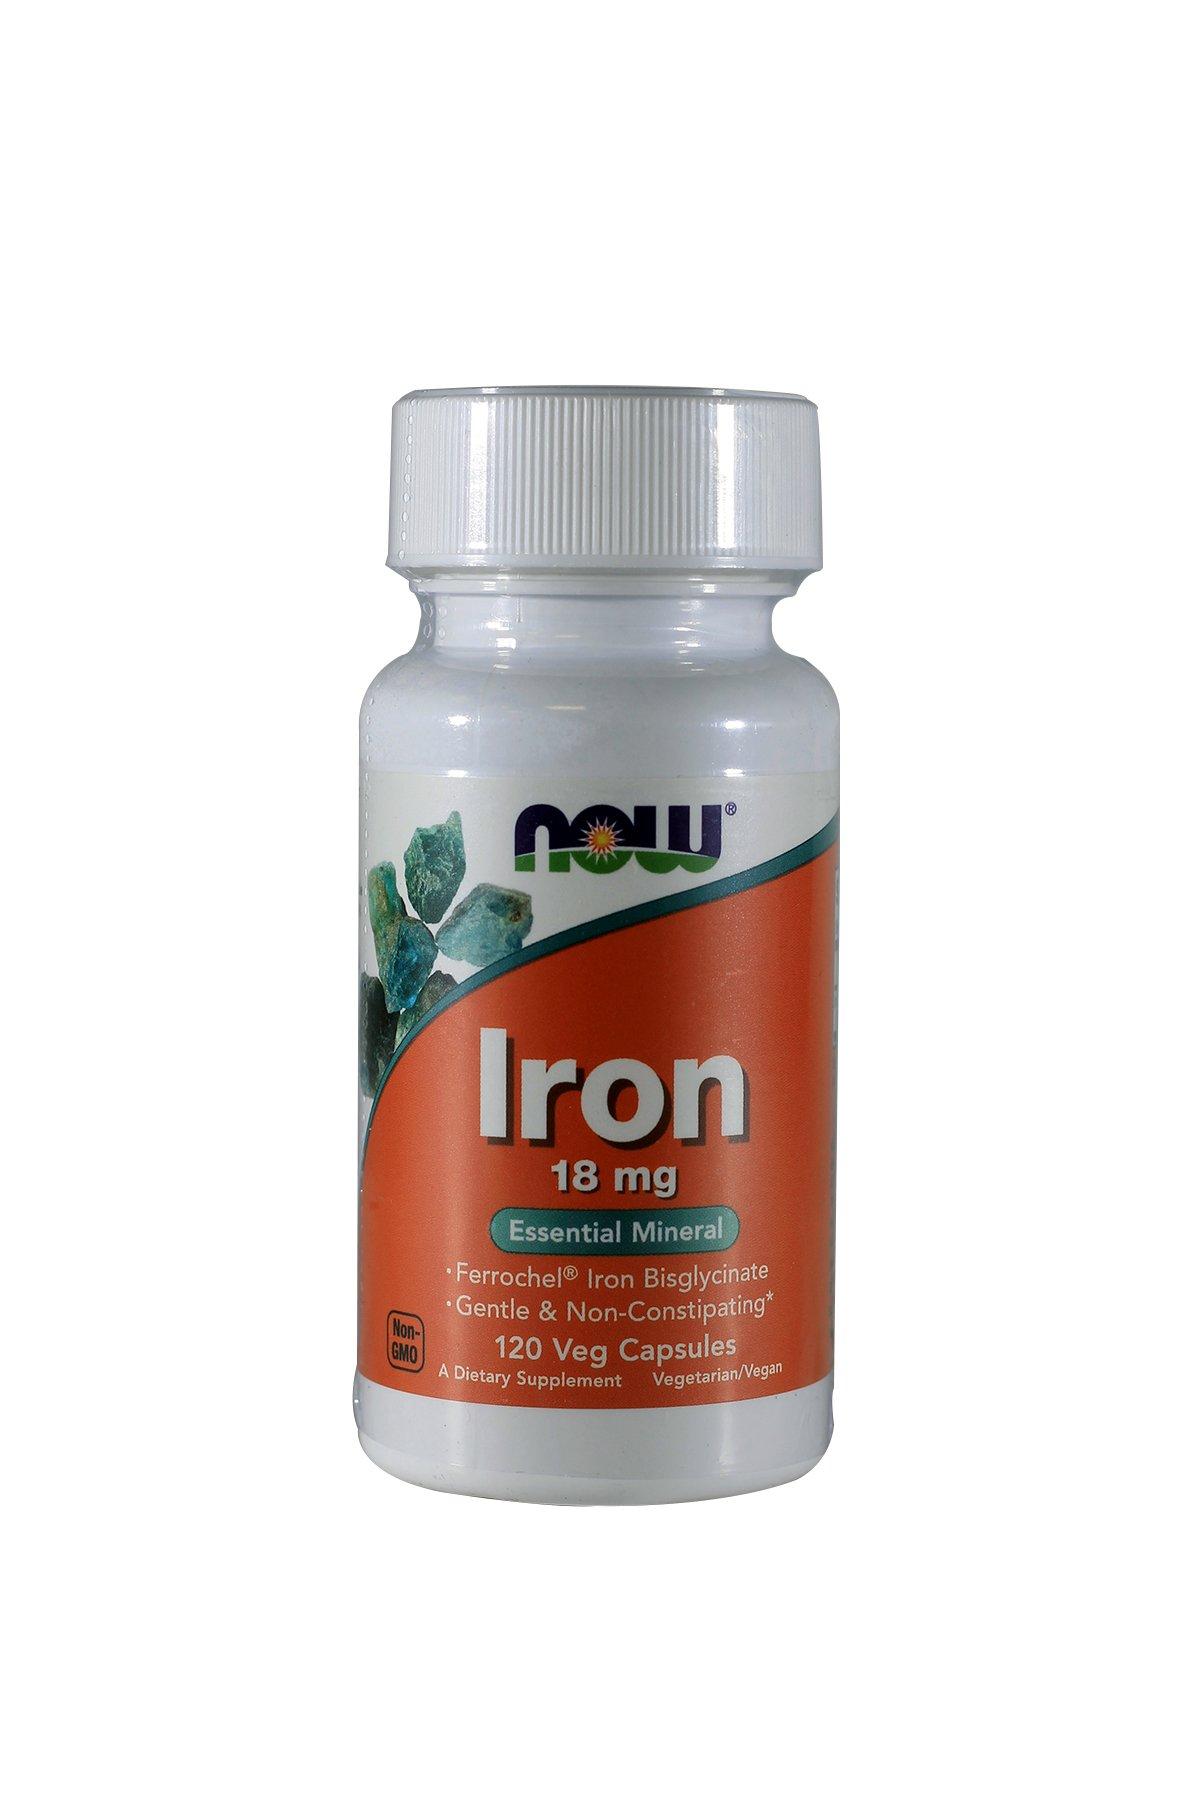 NOW Foods Iron Bisglycinate 18 mg Ferrochel -120 Vegi Caps